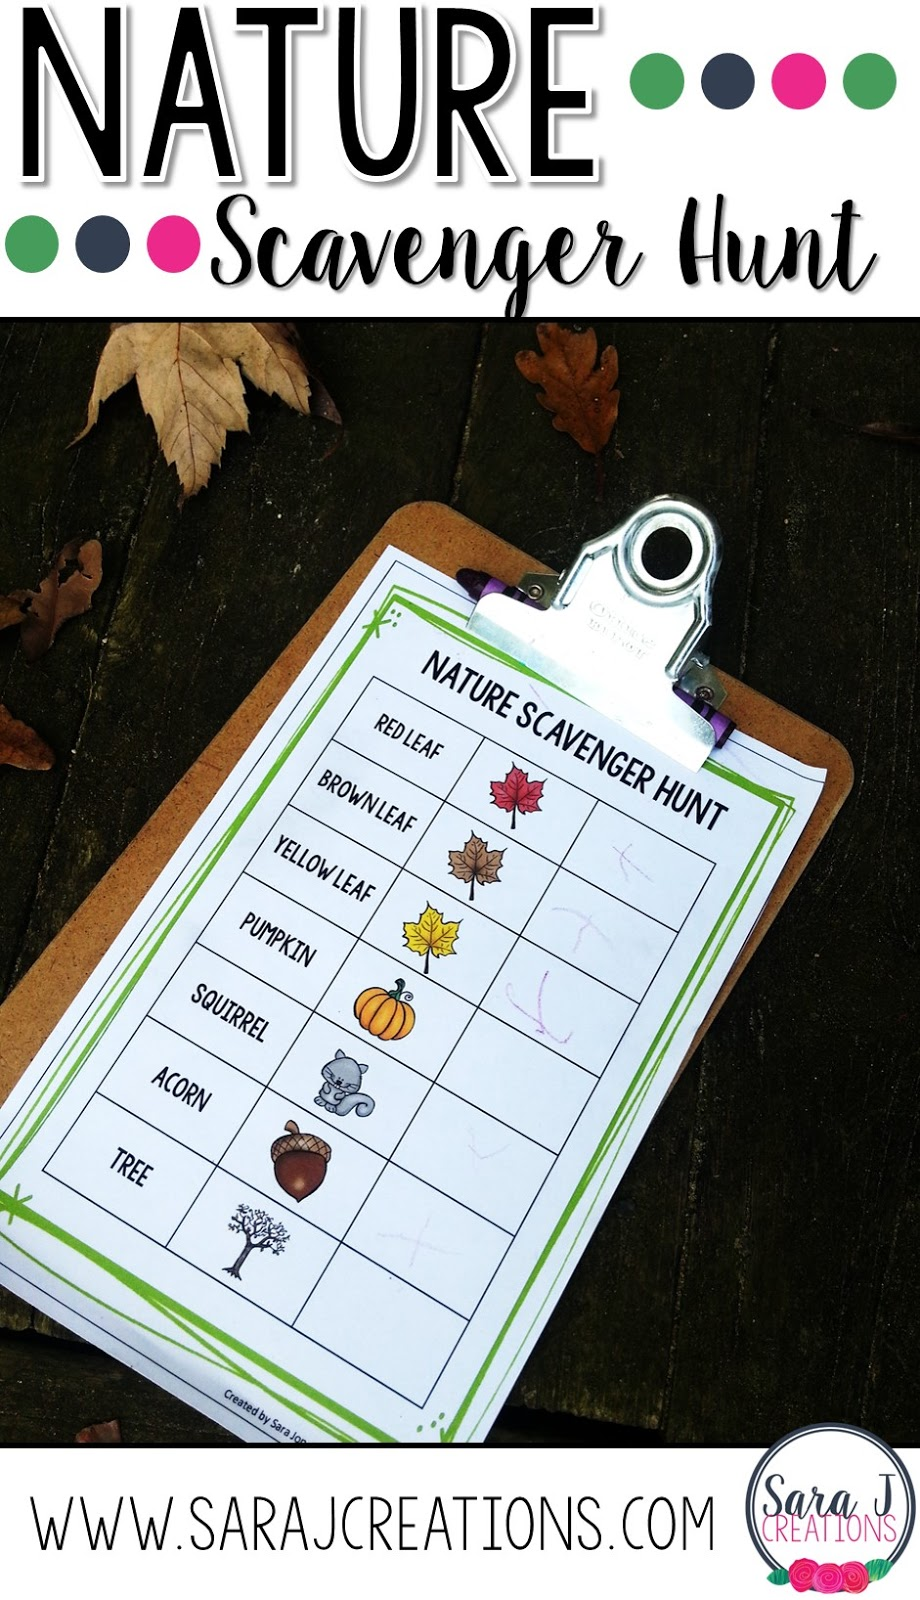 Cute fall nature scavenger hunt for preschoolers.